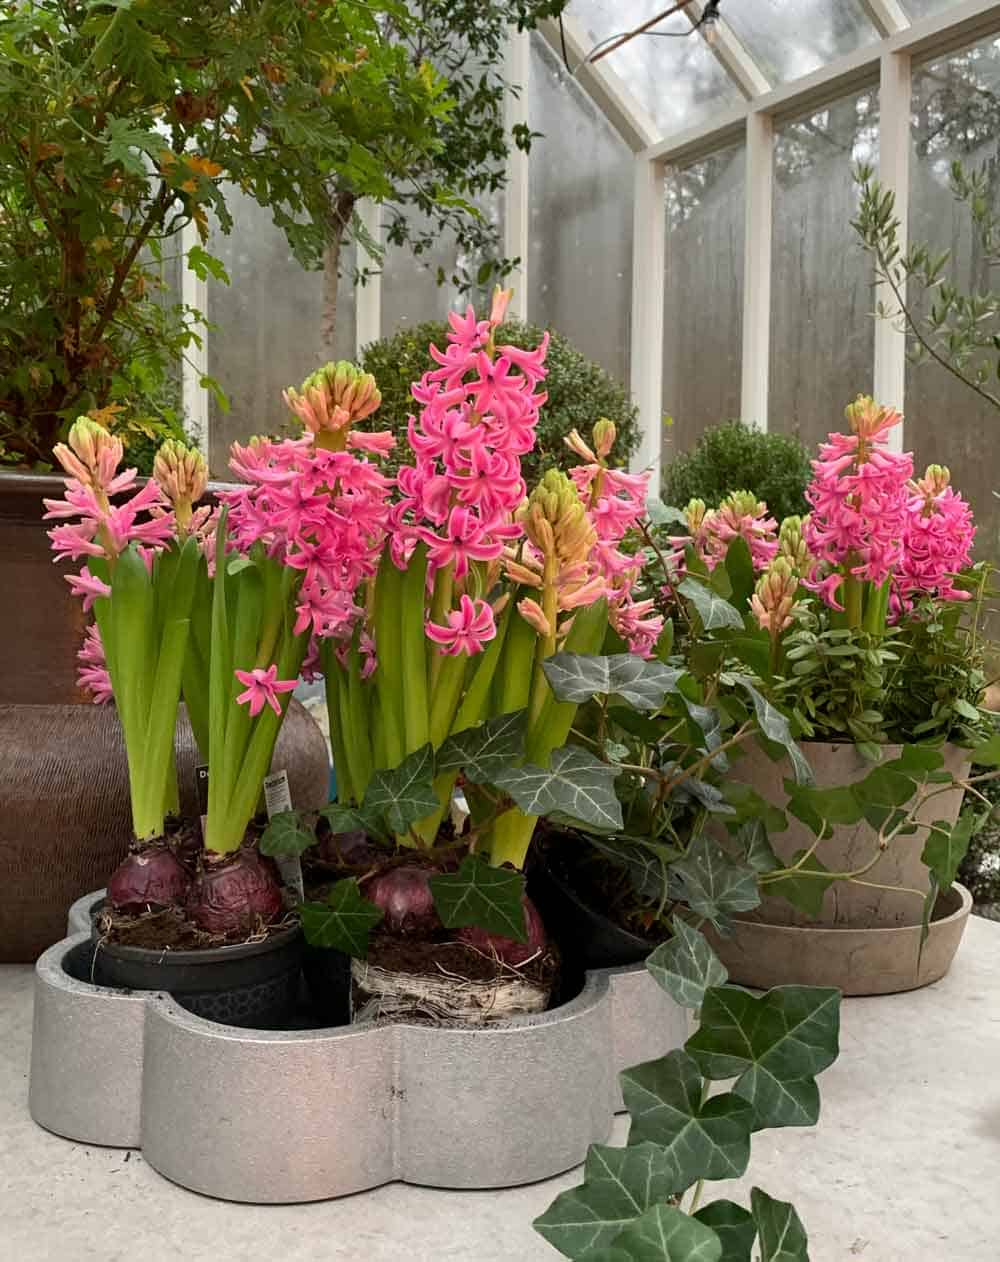 Blommande hyacintfat.